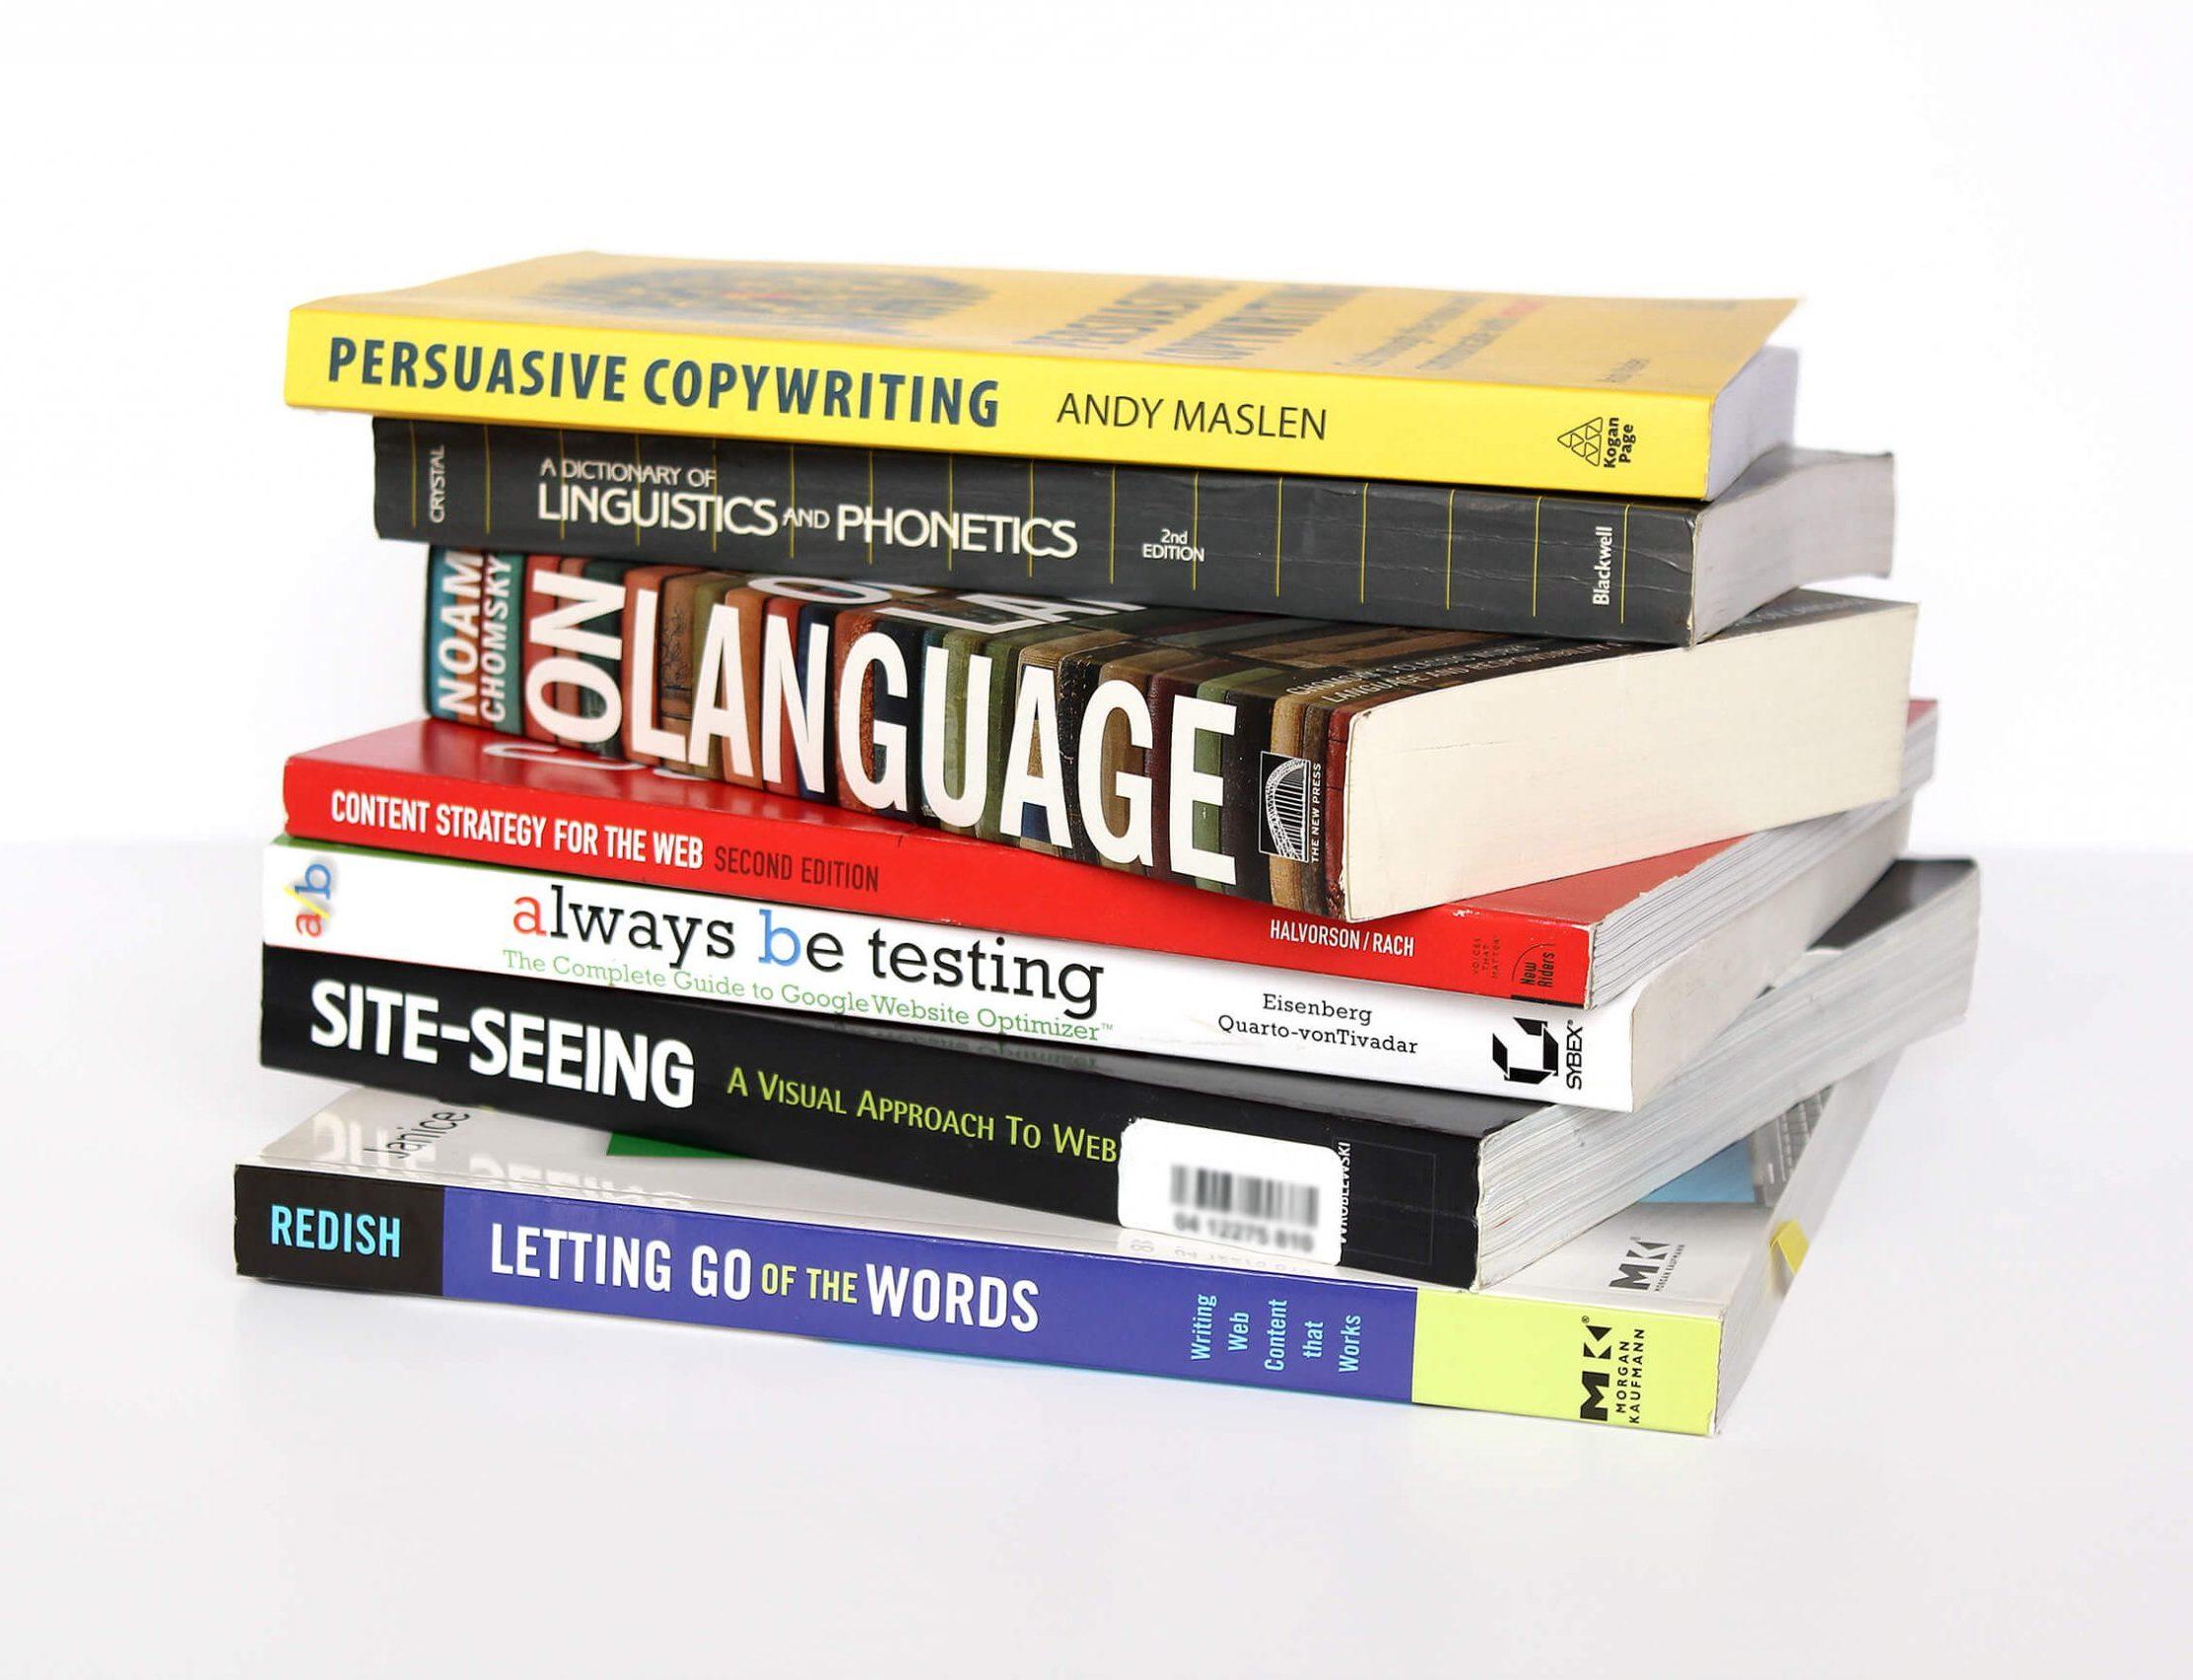 Web copywriting books stacked